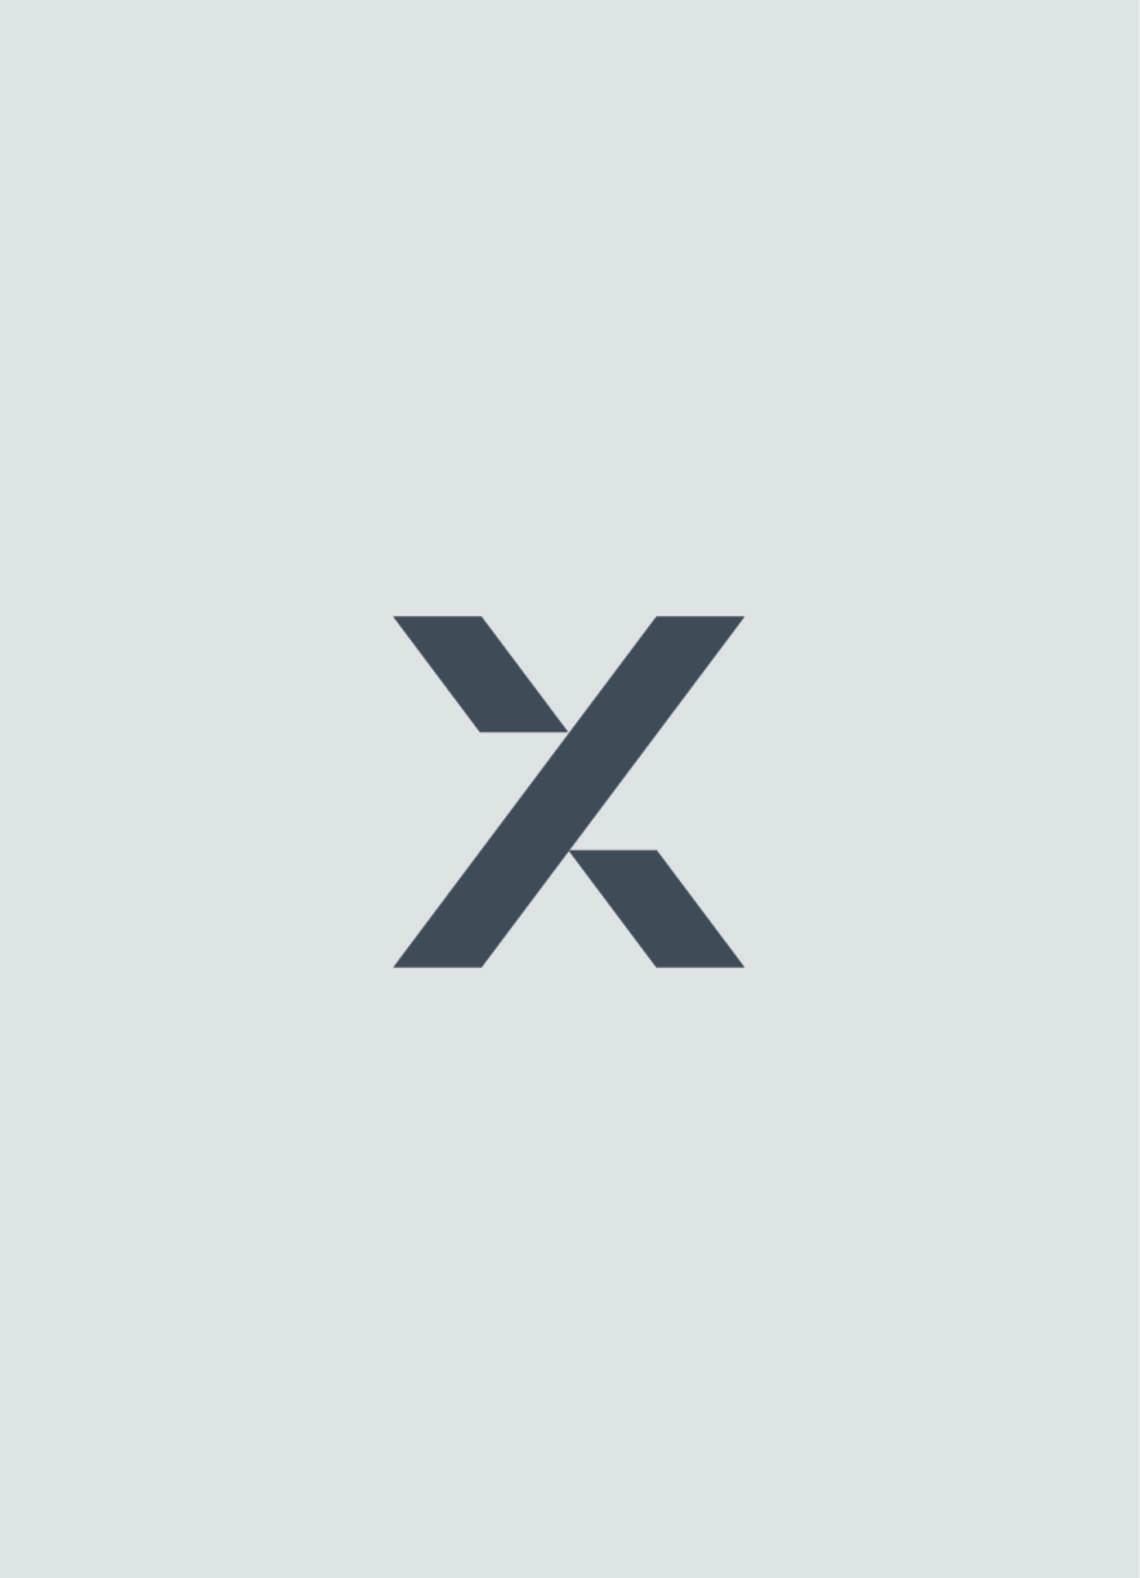 fenix-ntm_136_001.jpg